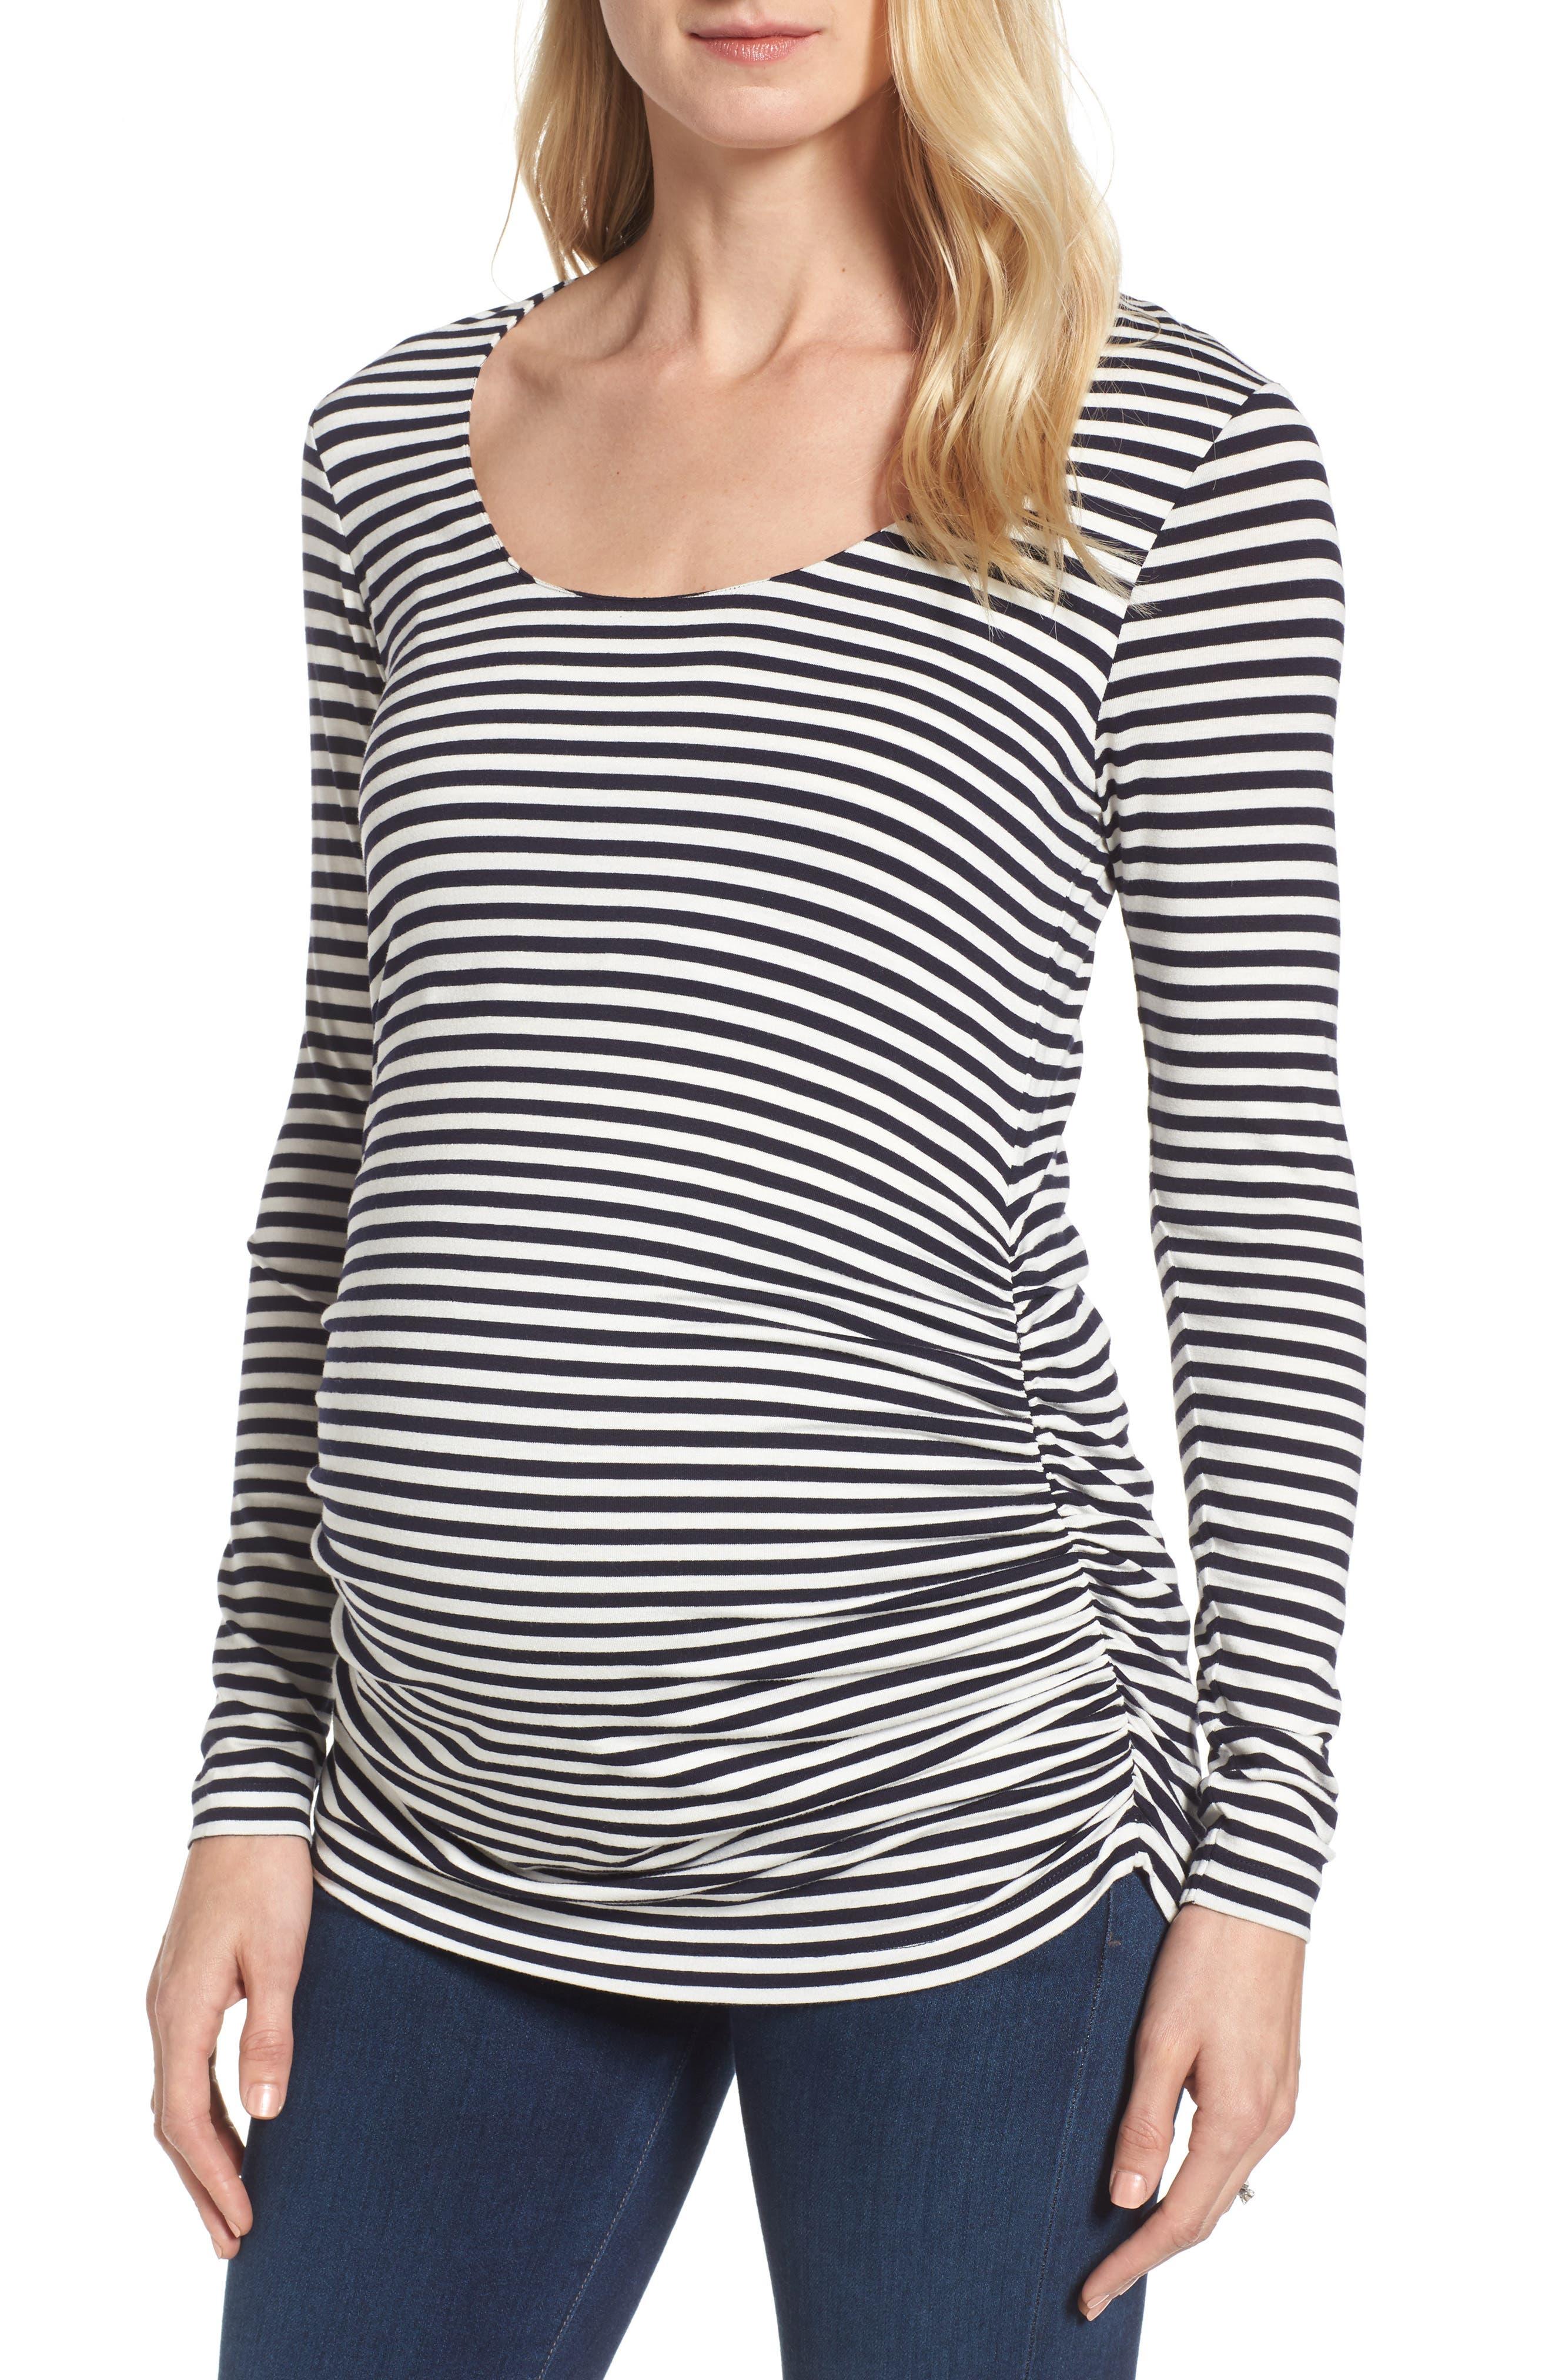 Arlington Stripe Maternity Tee,                             Main thumbnail 1, color,                             NAVY/ OFF WHITE